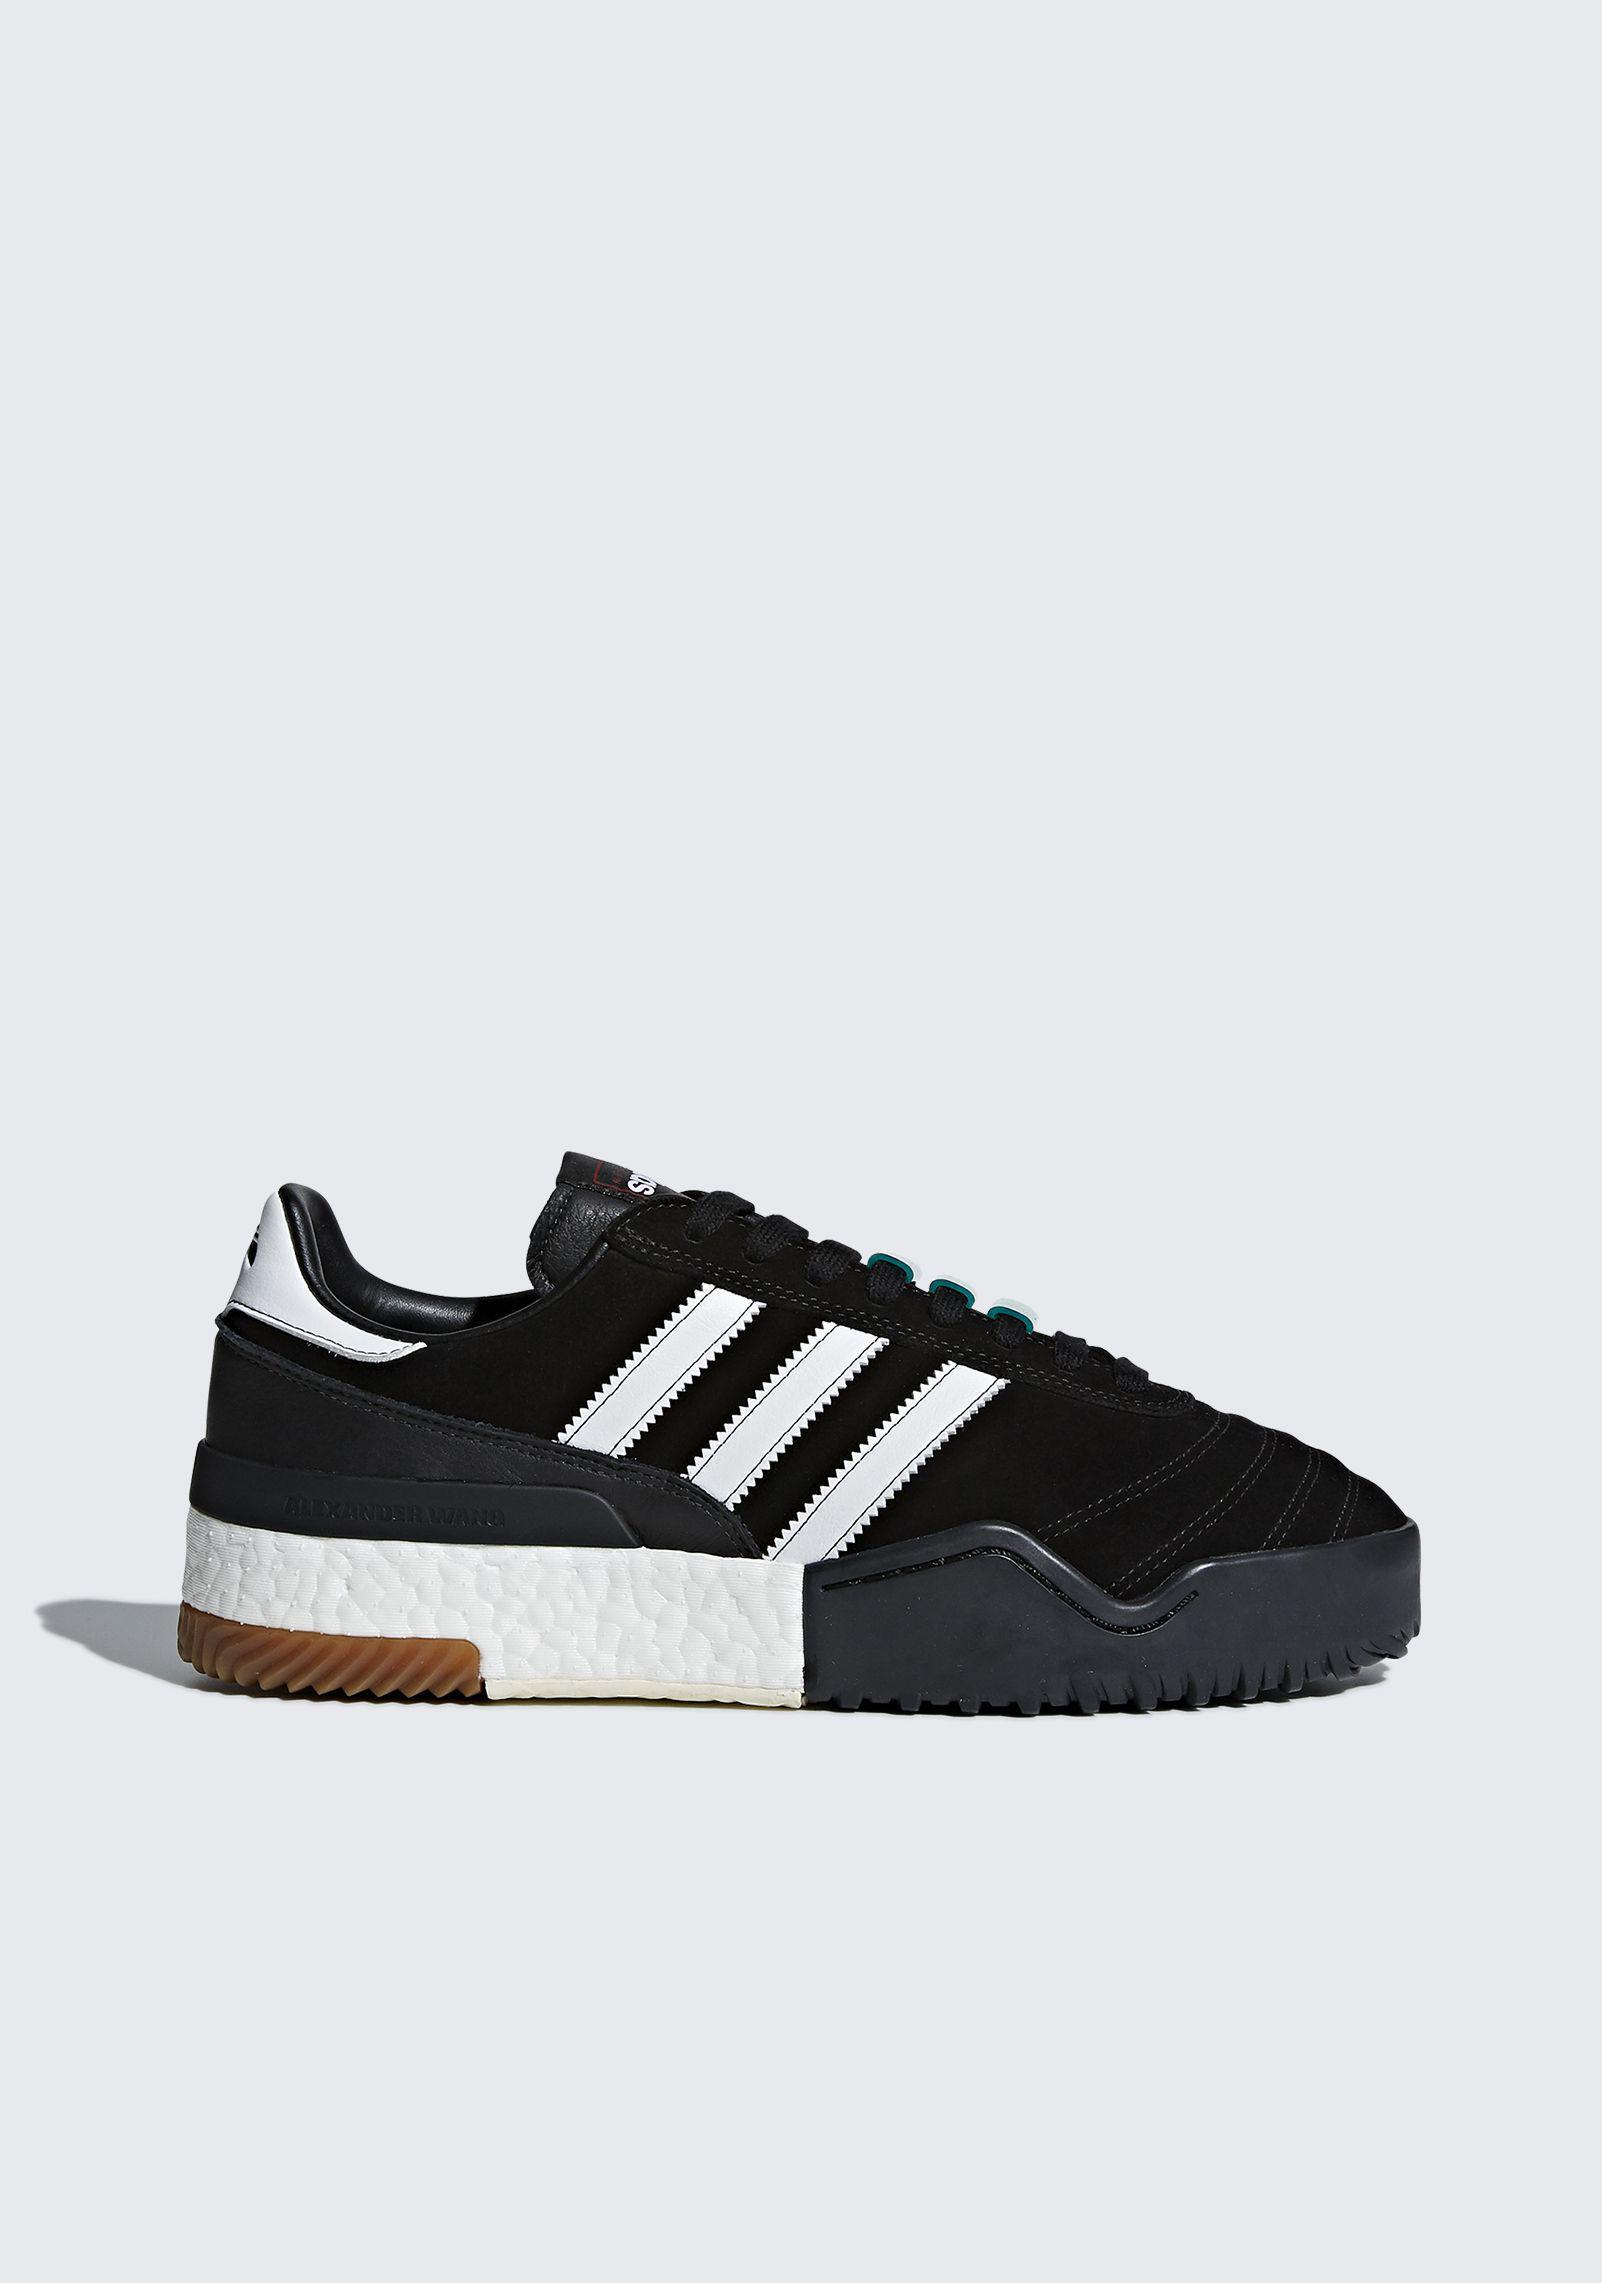 watch adebd 79fc7 alexander-wang-Black-Adidas-Originals-By-Aw-Bball-Soccer-Shoes.jpeg